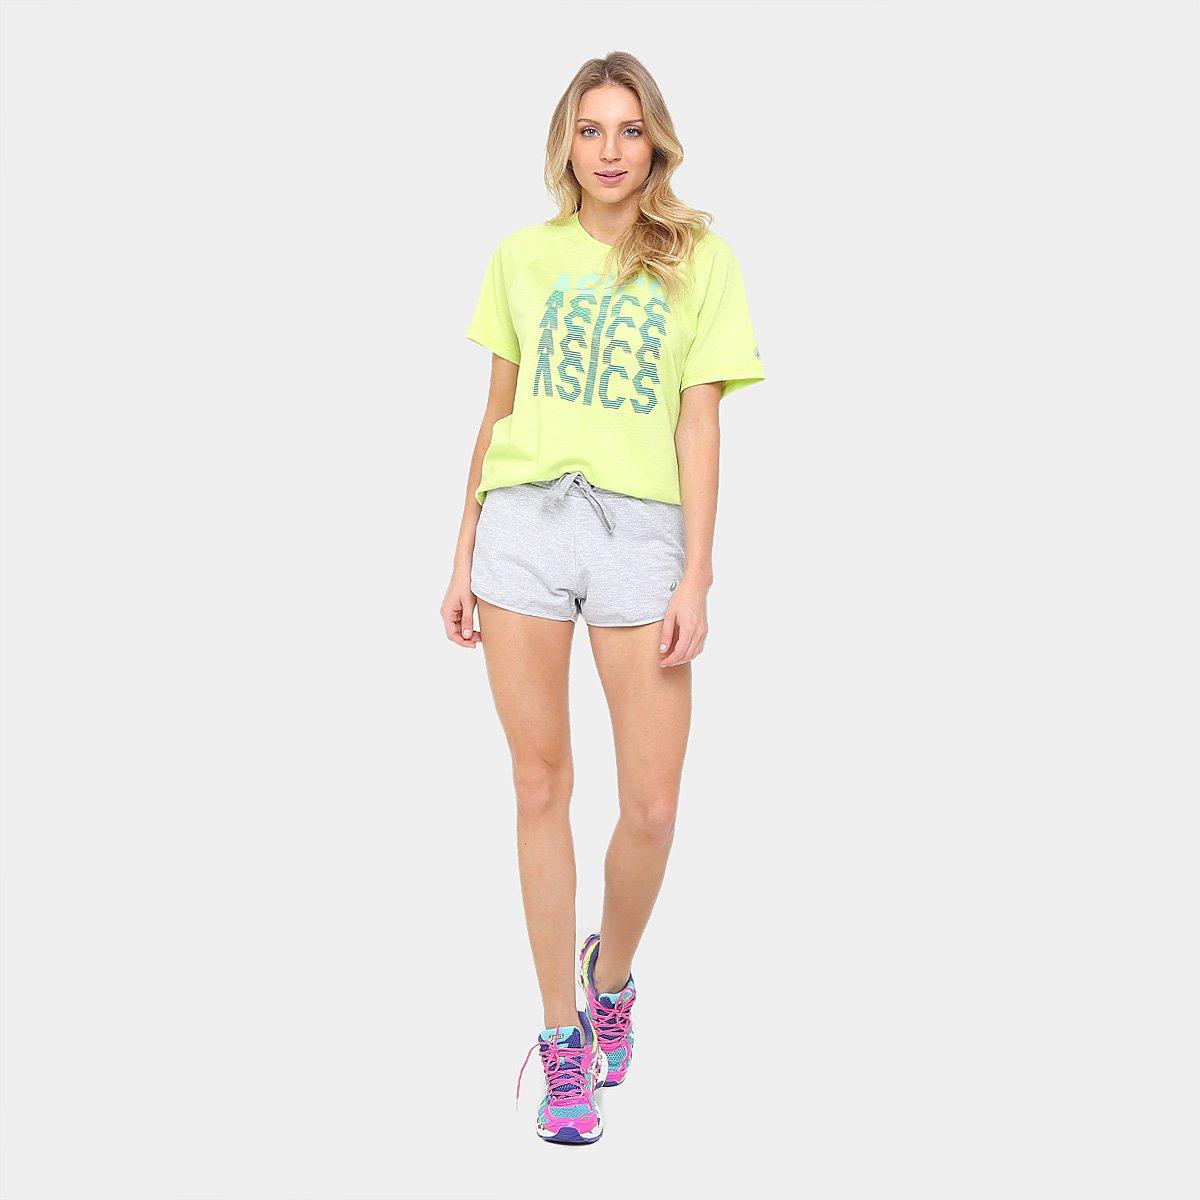 Camiseta Ss Limão Asics Amarelo Asics Camiseta Masculina Training Tee Asics TCfd4